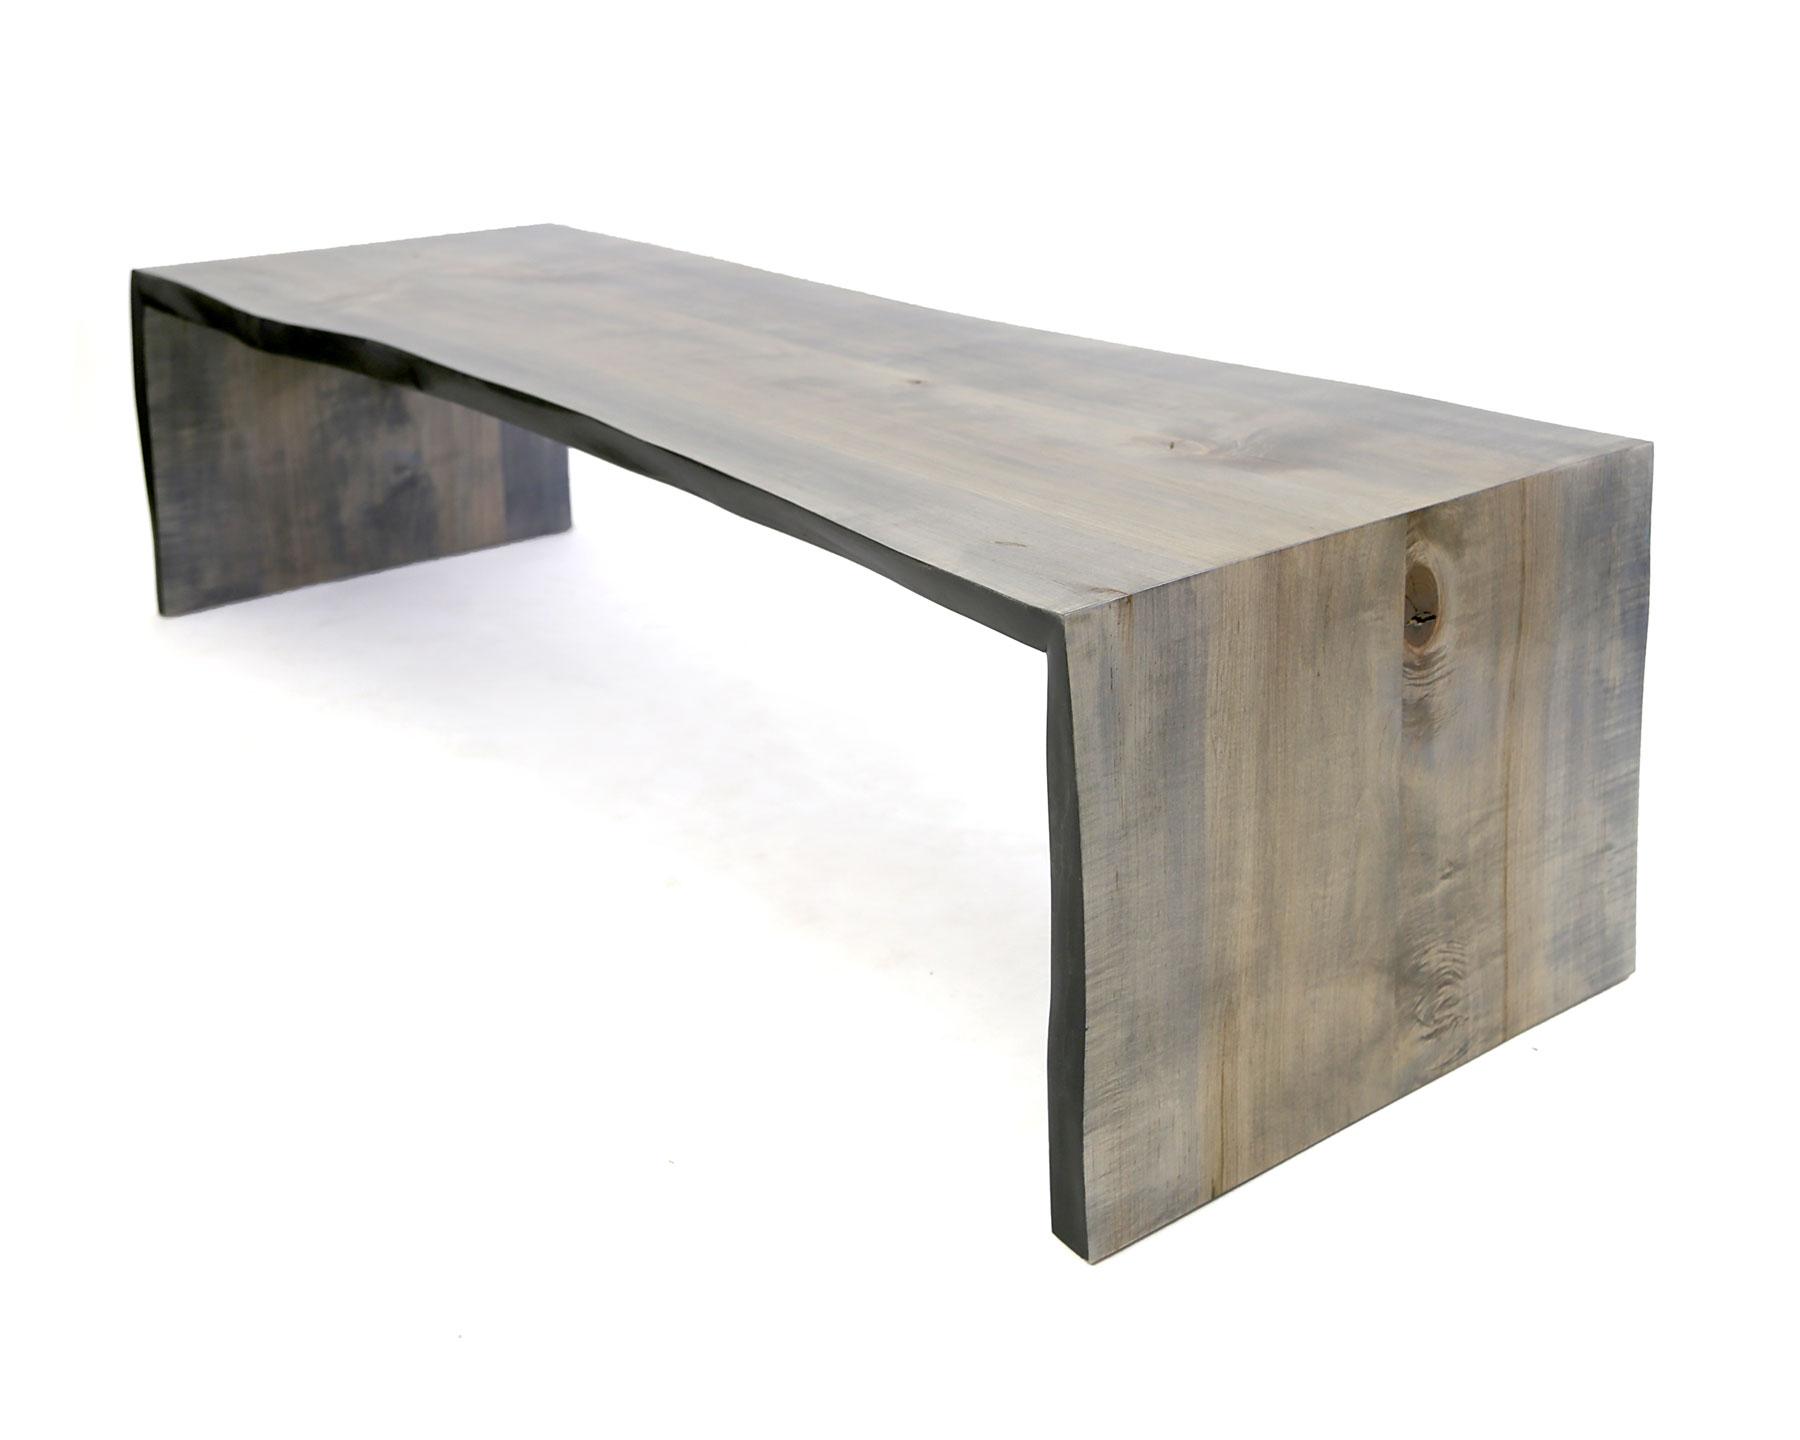 Folded Live Edge Driftwood Table